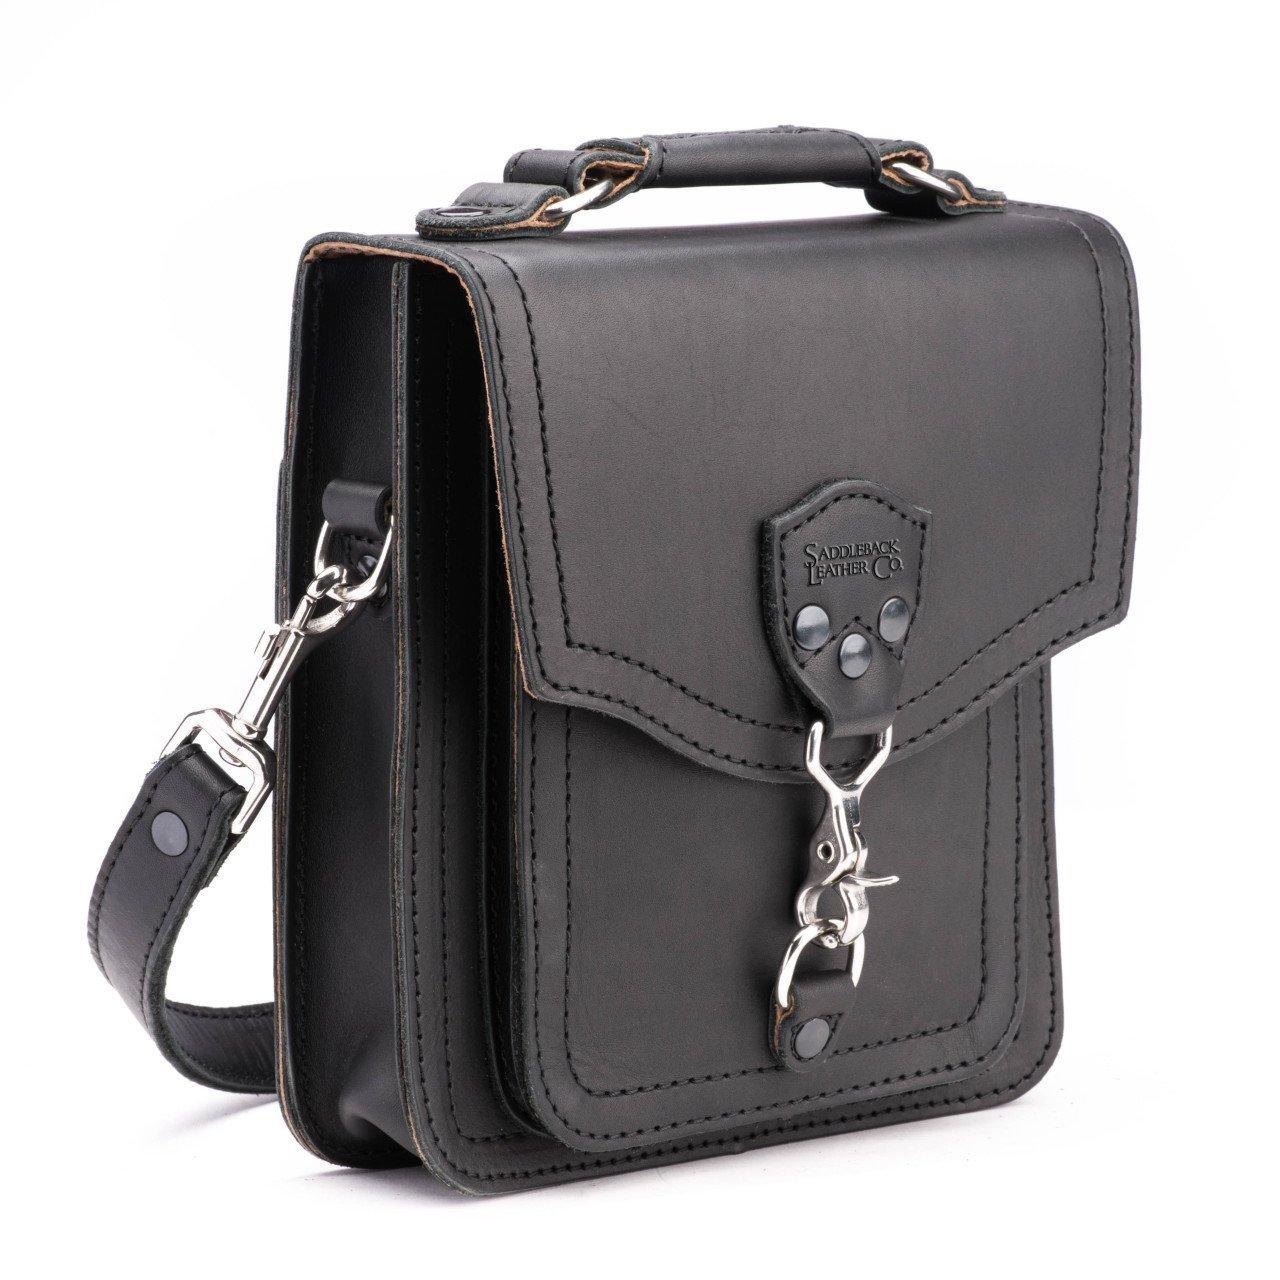 Saddleback Leather Front Pocket Pouch Black by Saddleback Leather Co.